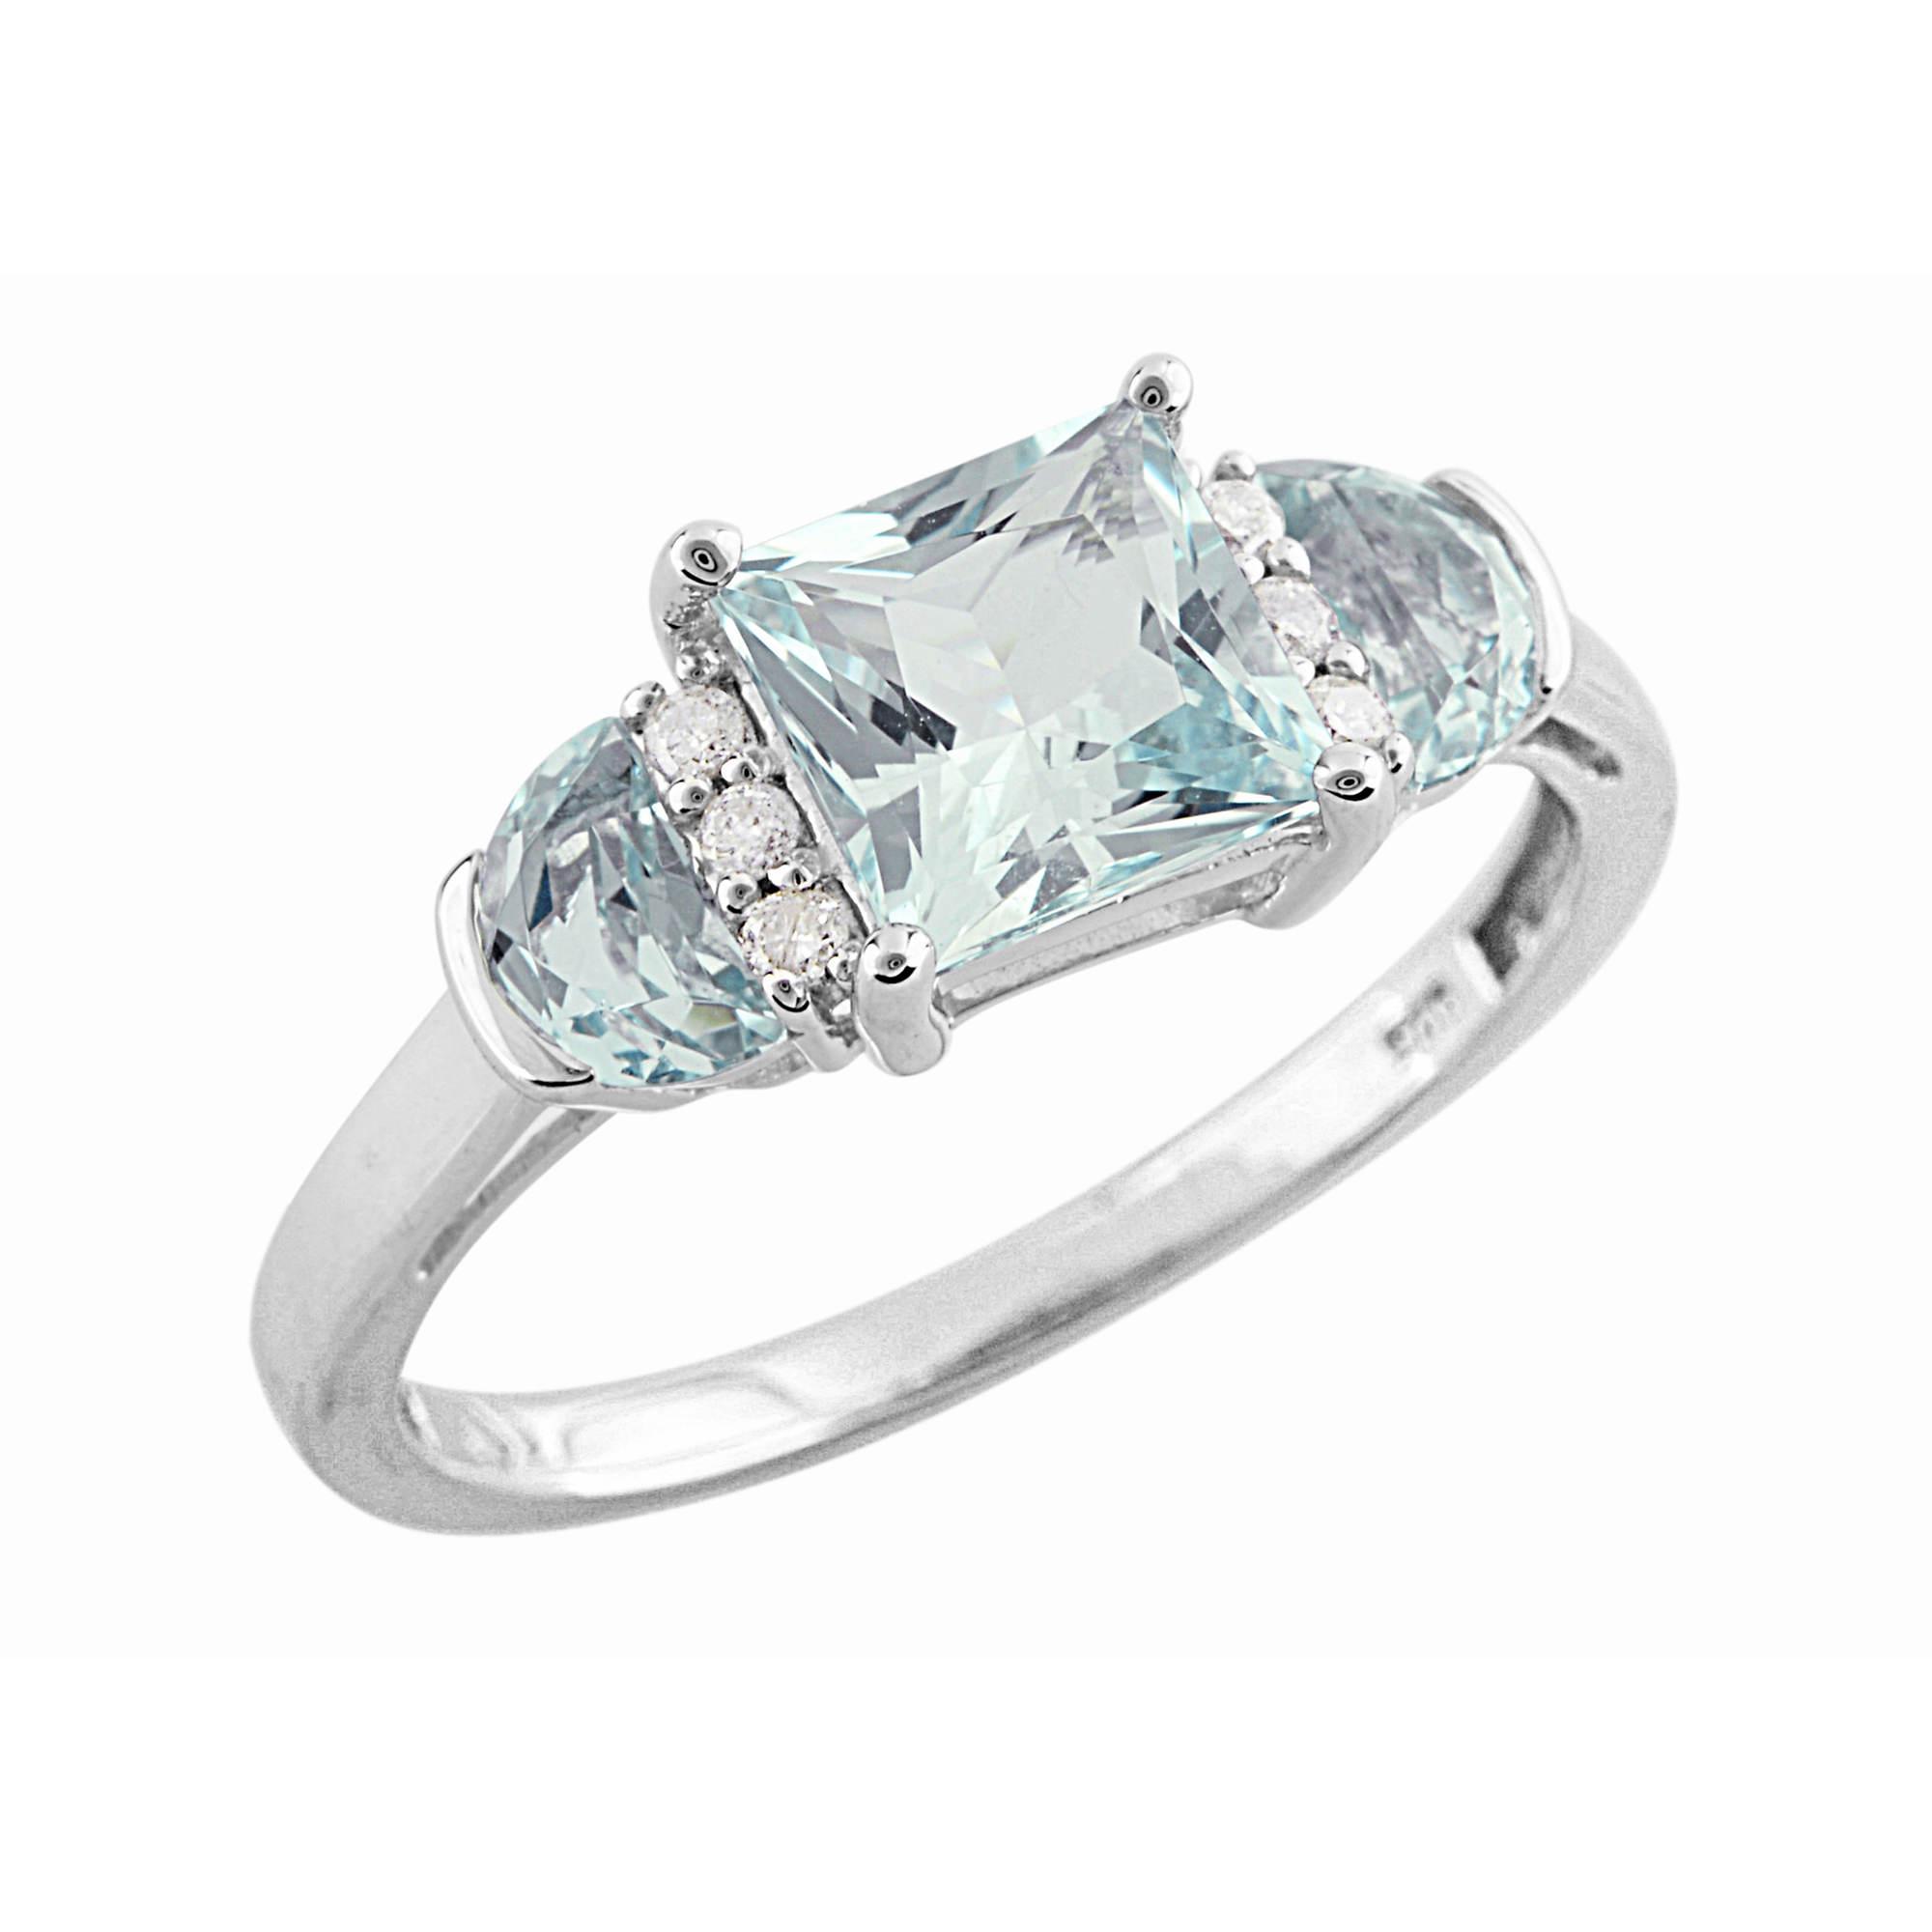 1 25 ct t w princess cut aquamarine and ring in